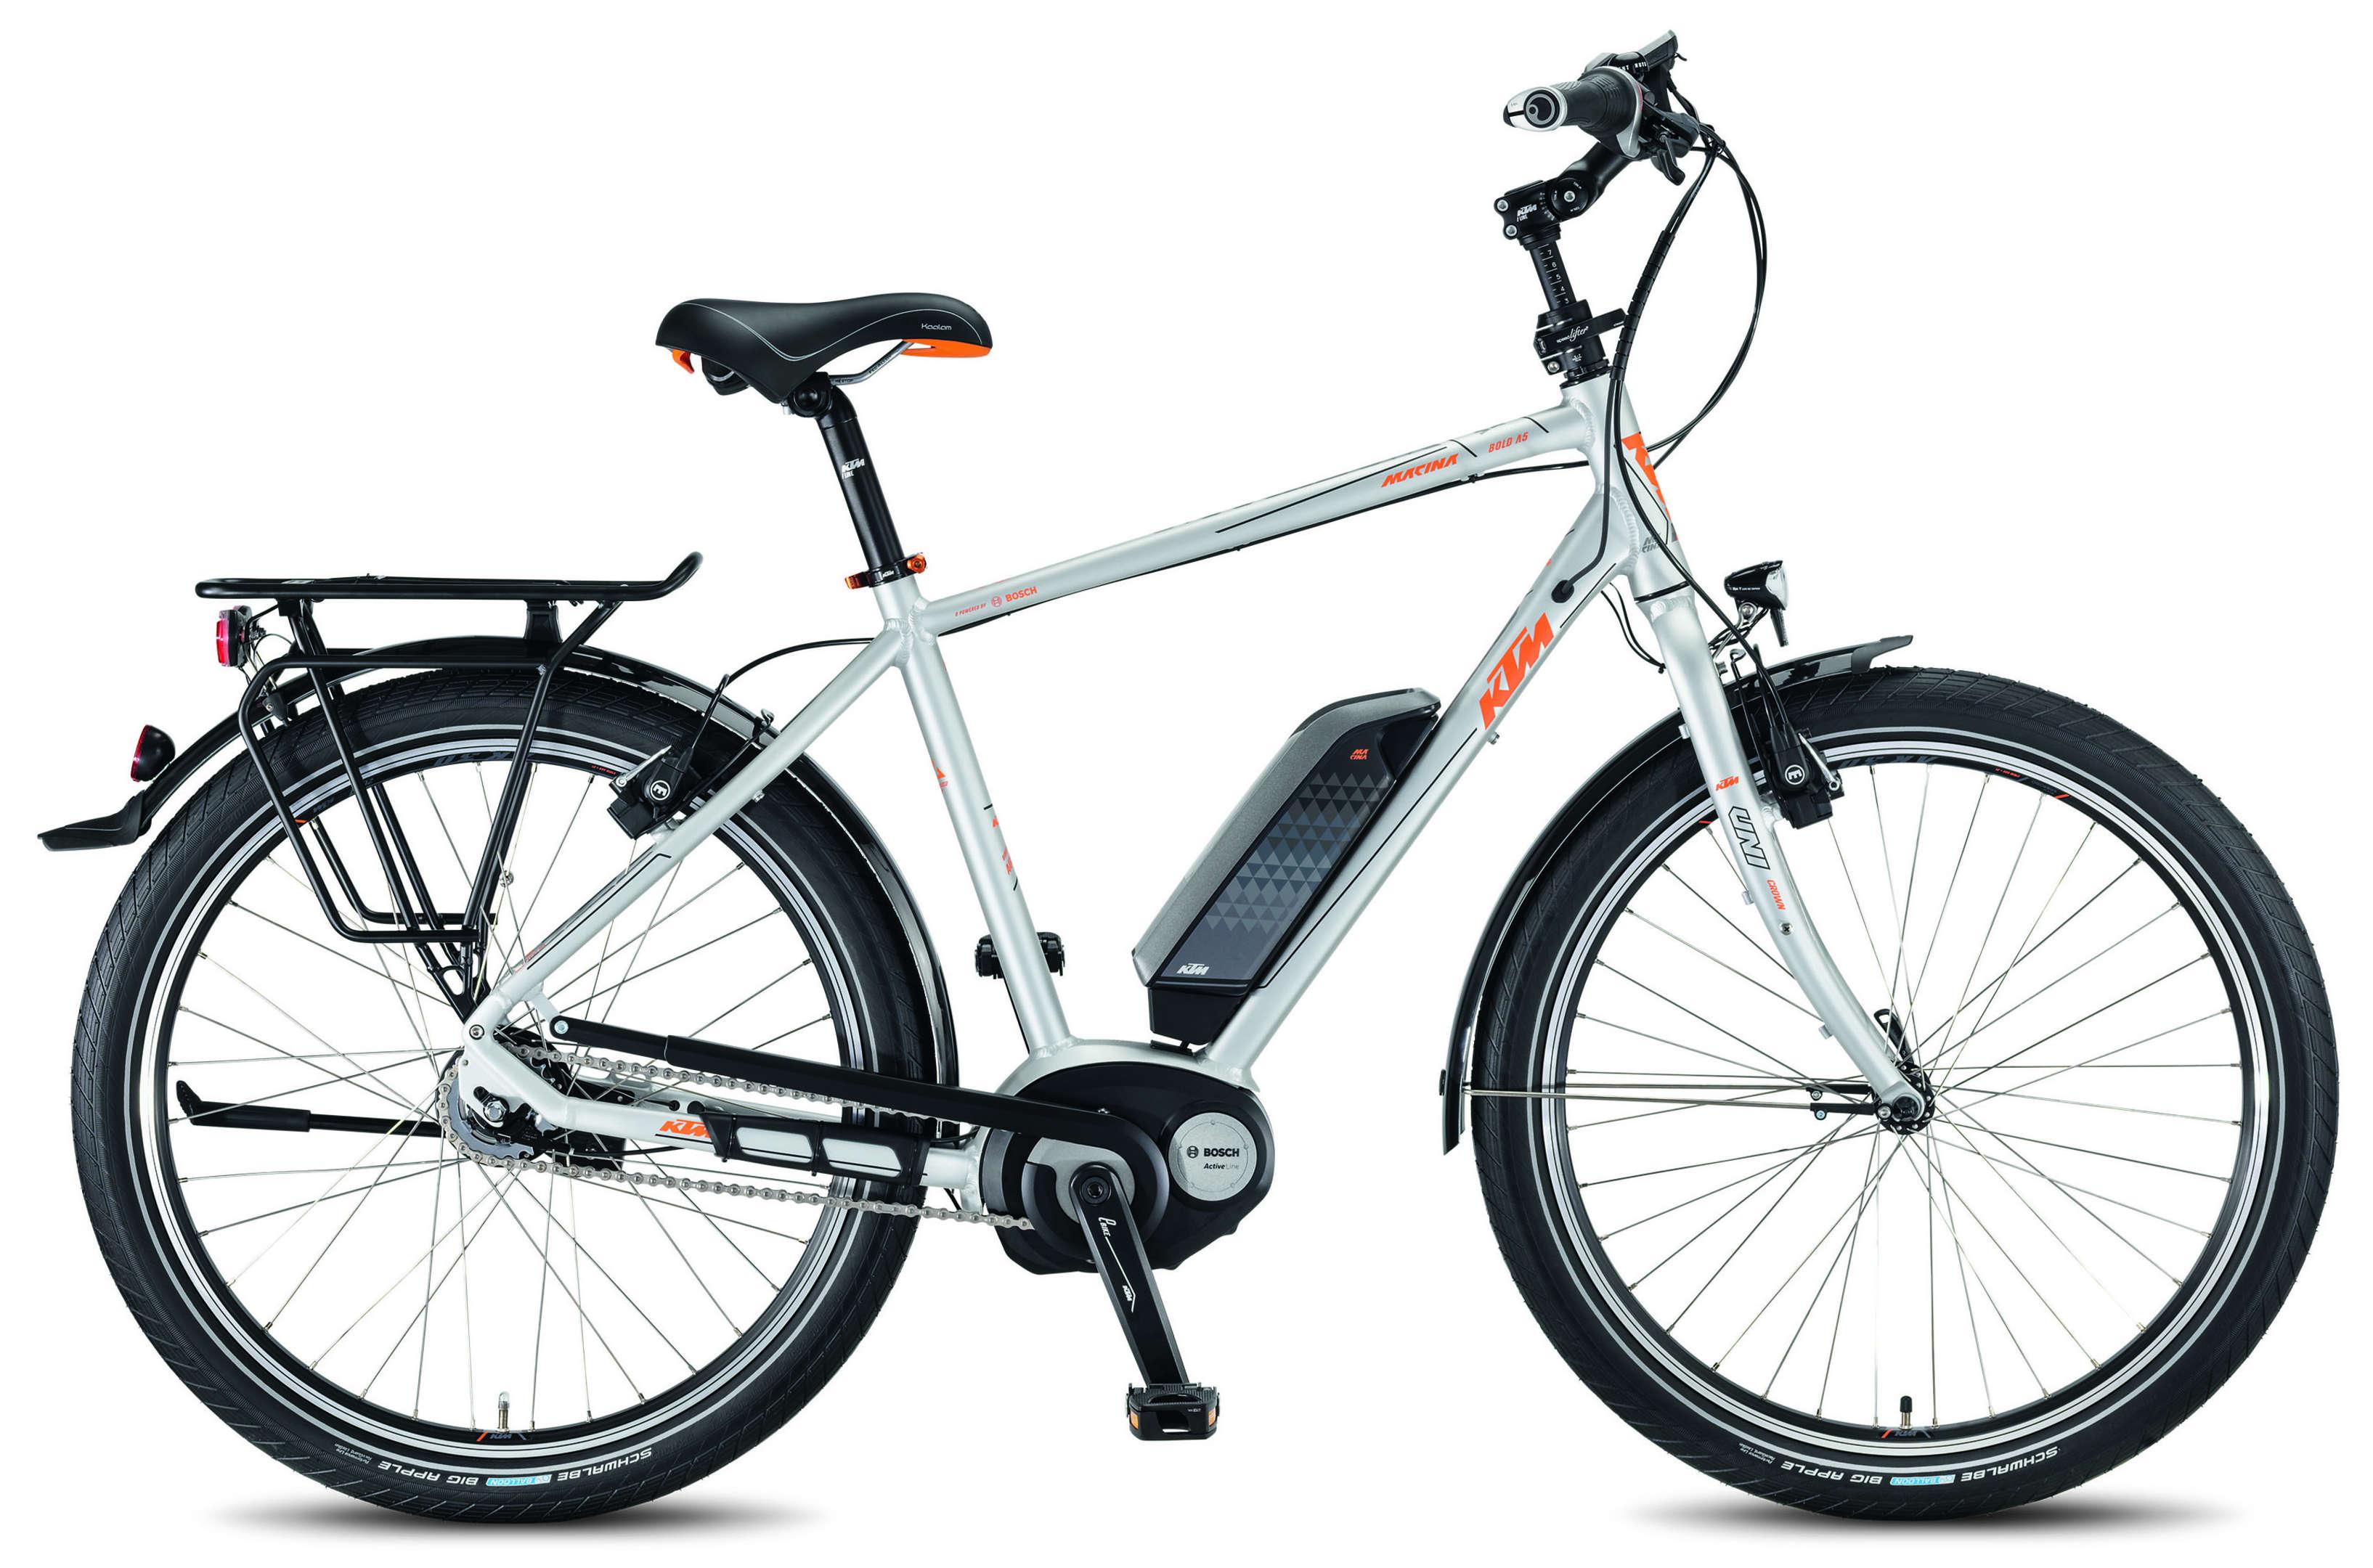 ktm e bike macina bold 8 a5 eurorad bikeleasingeurorad bikeleasing. Black Bedroom Furniture Sets. Home Design Ideas